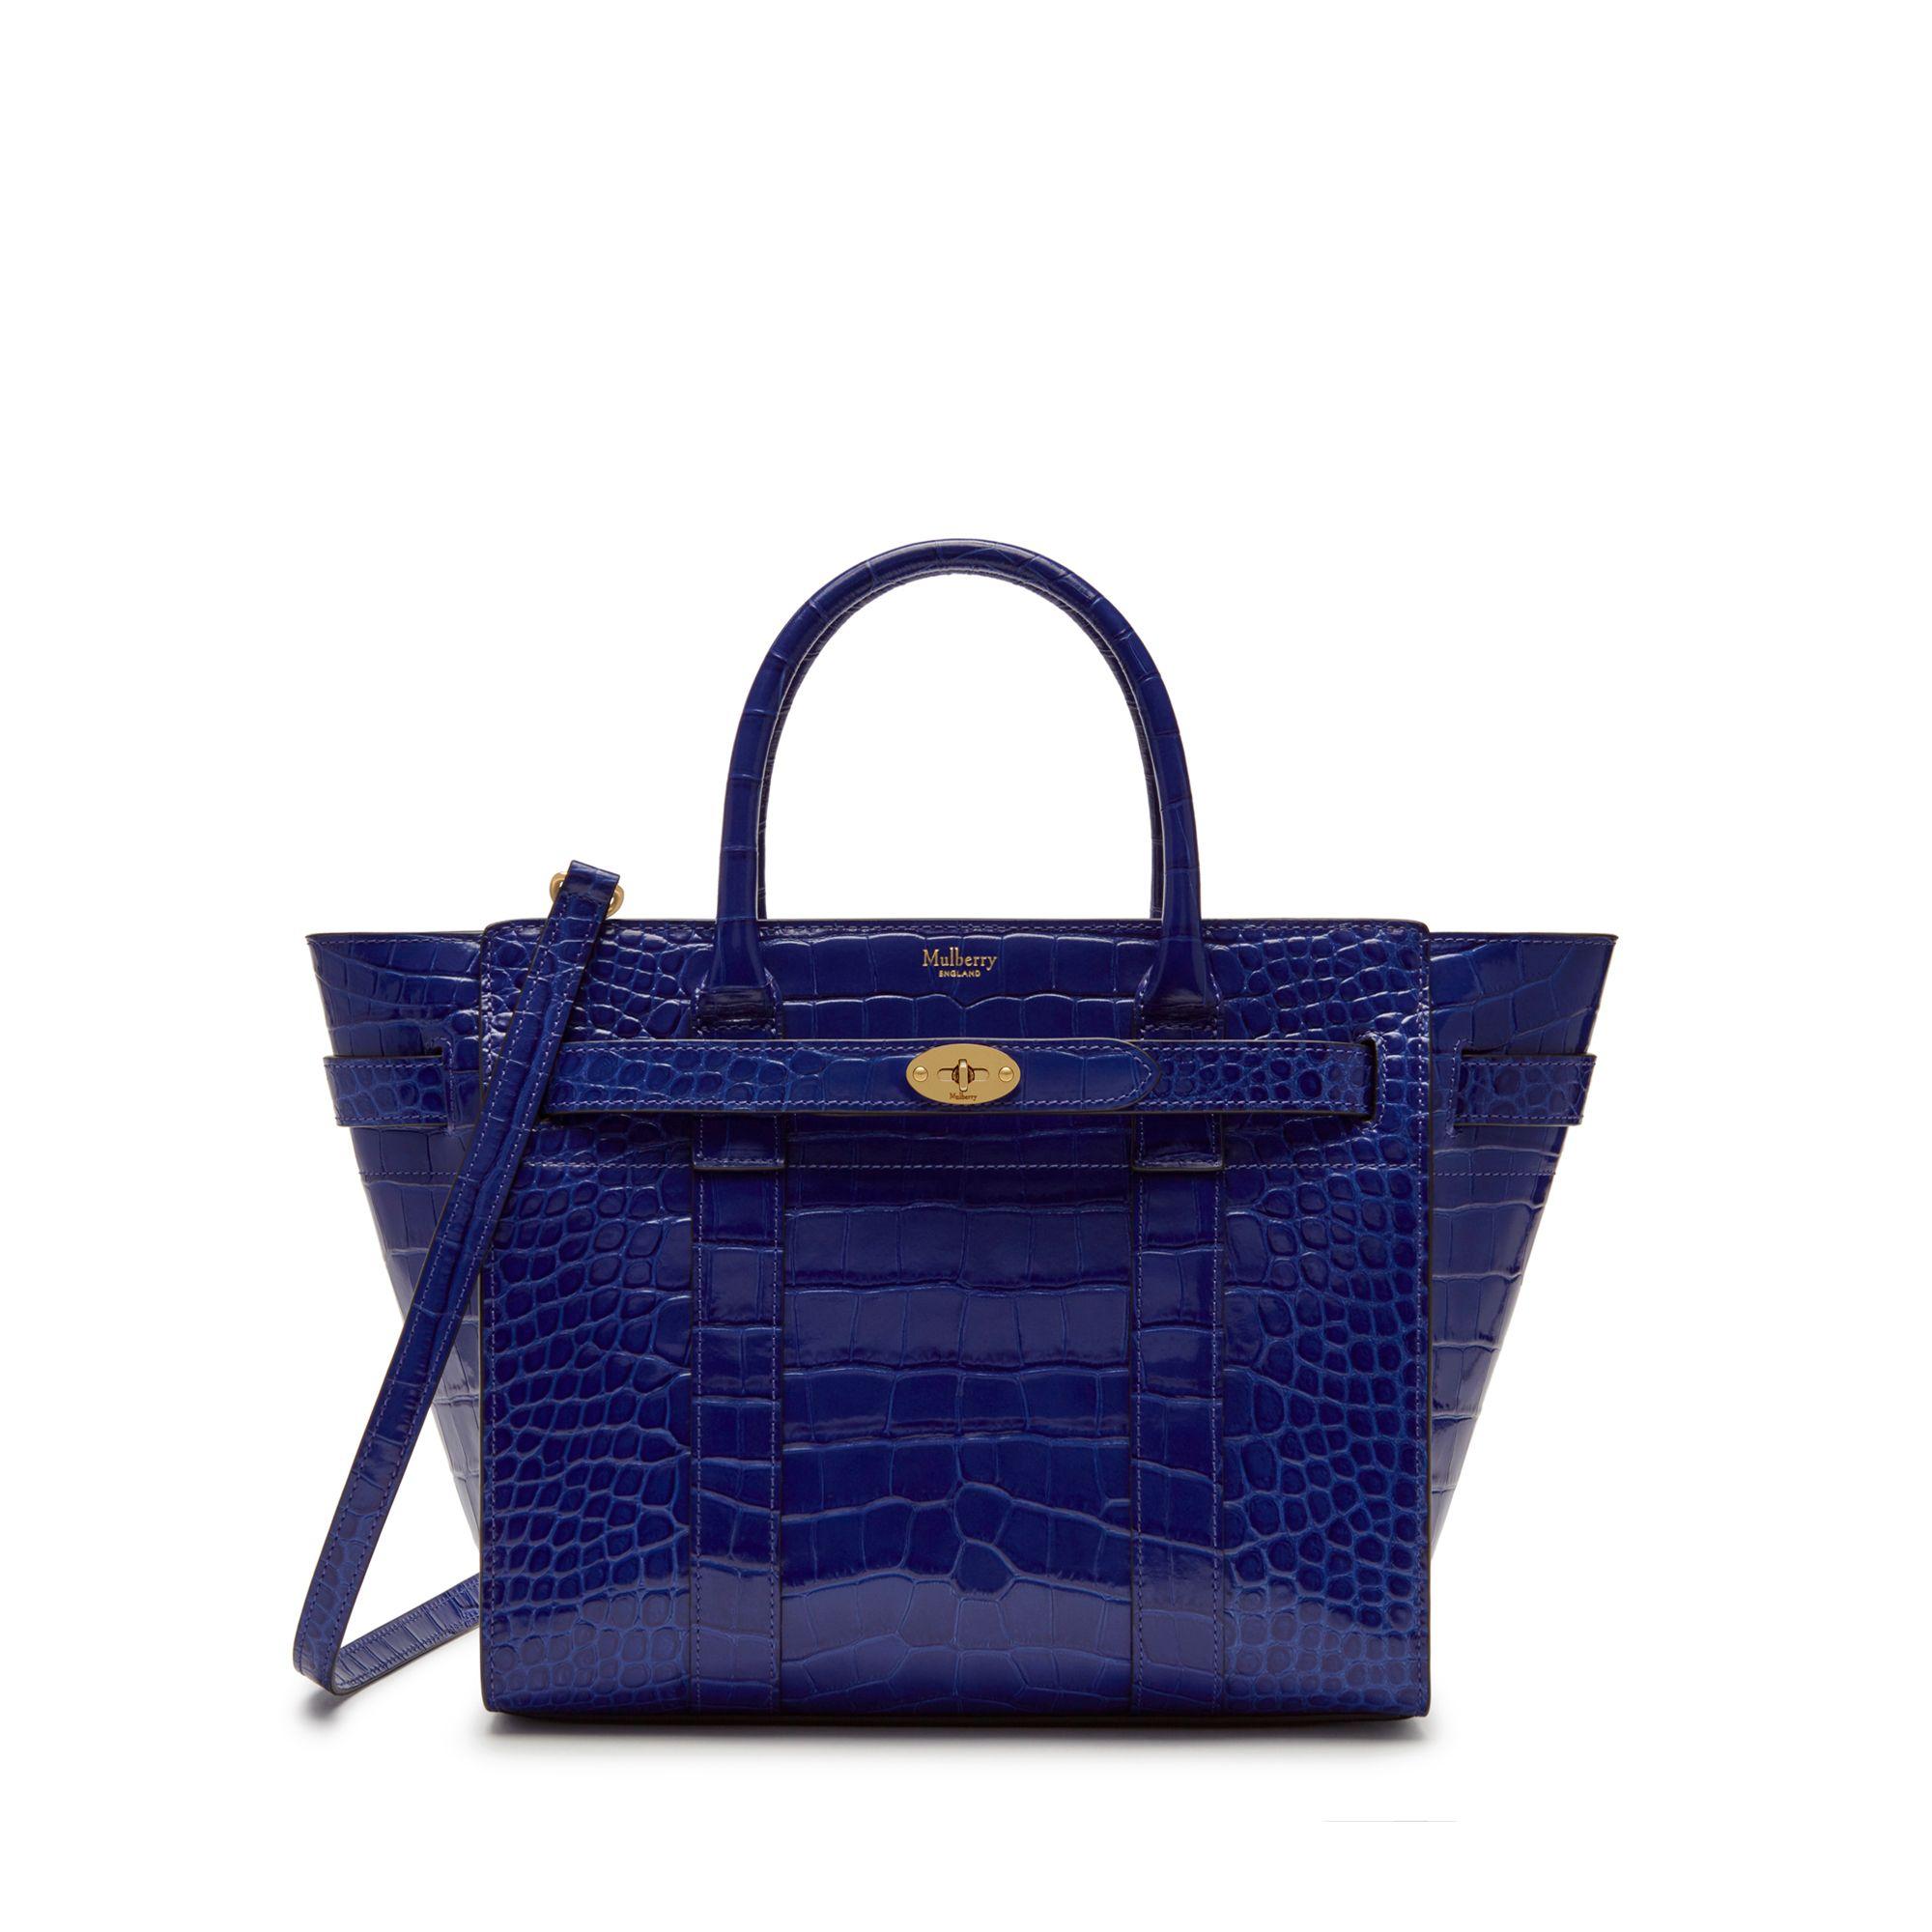 2e0b3081aad0 Women s Bags